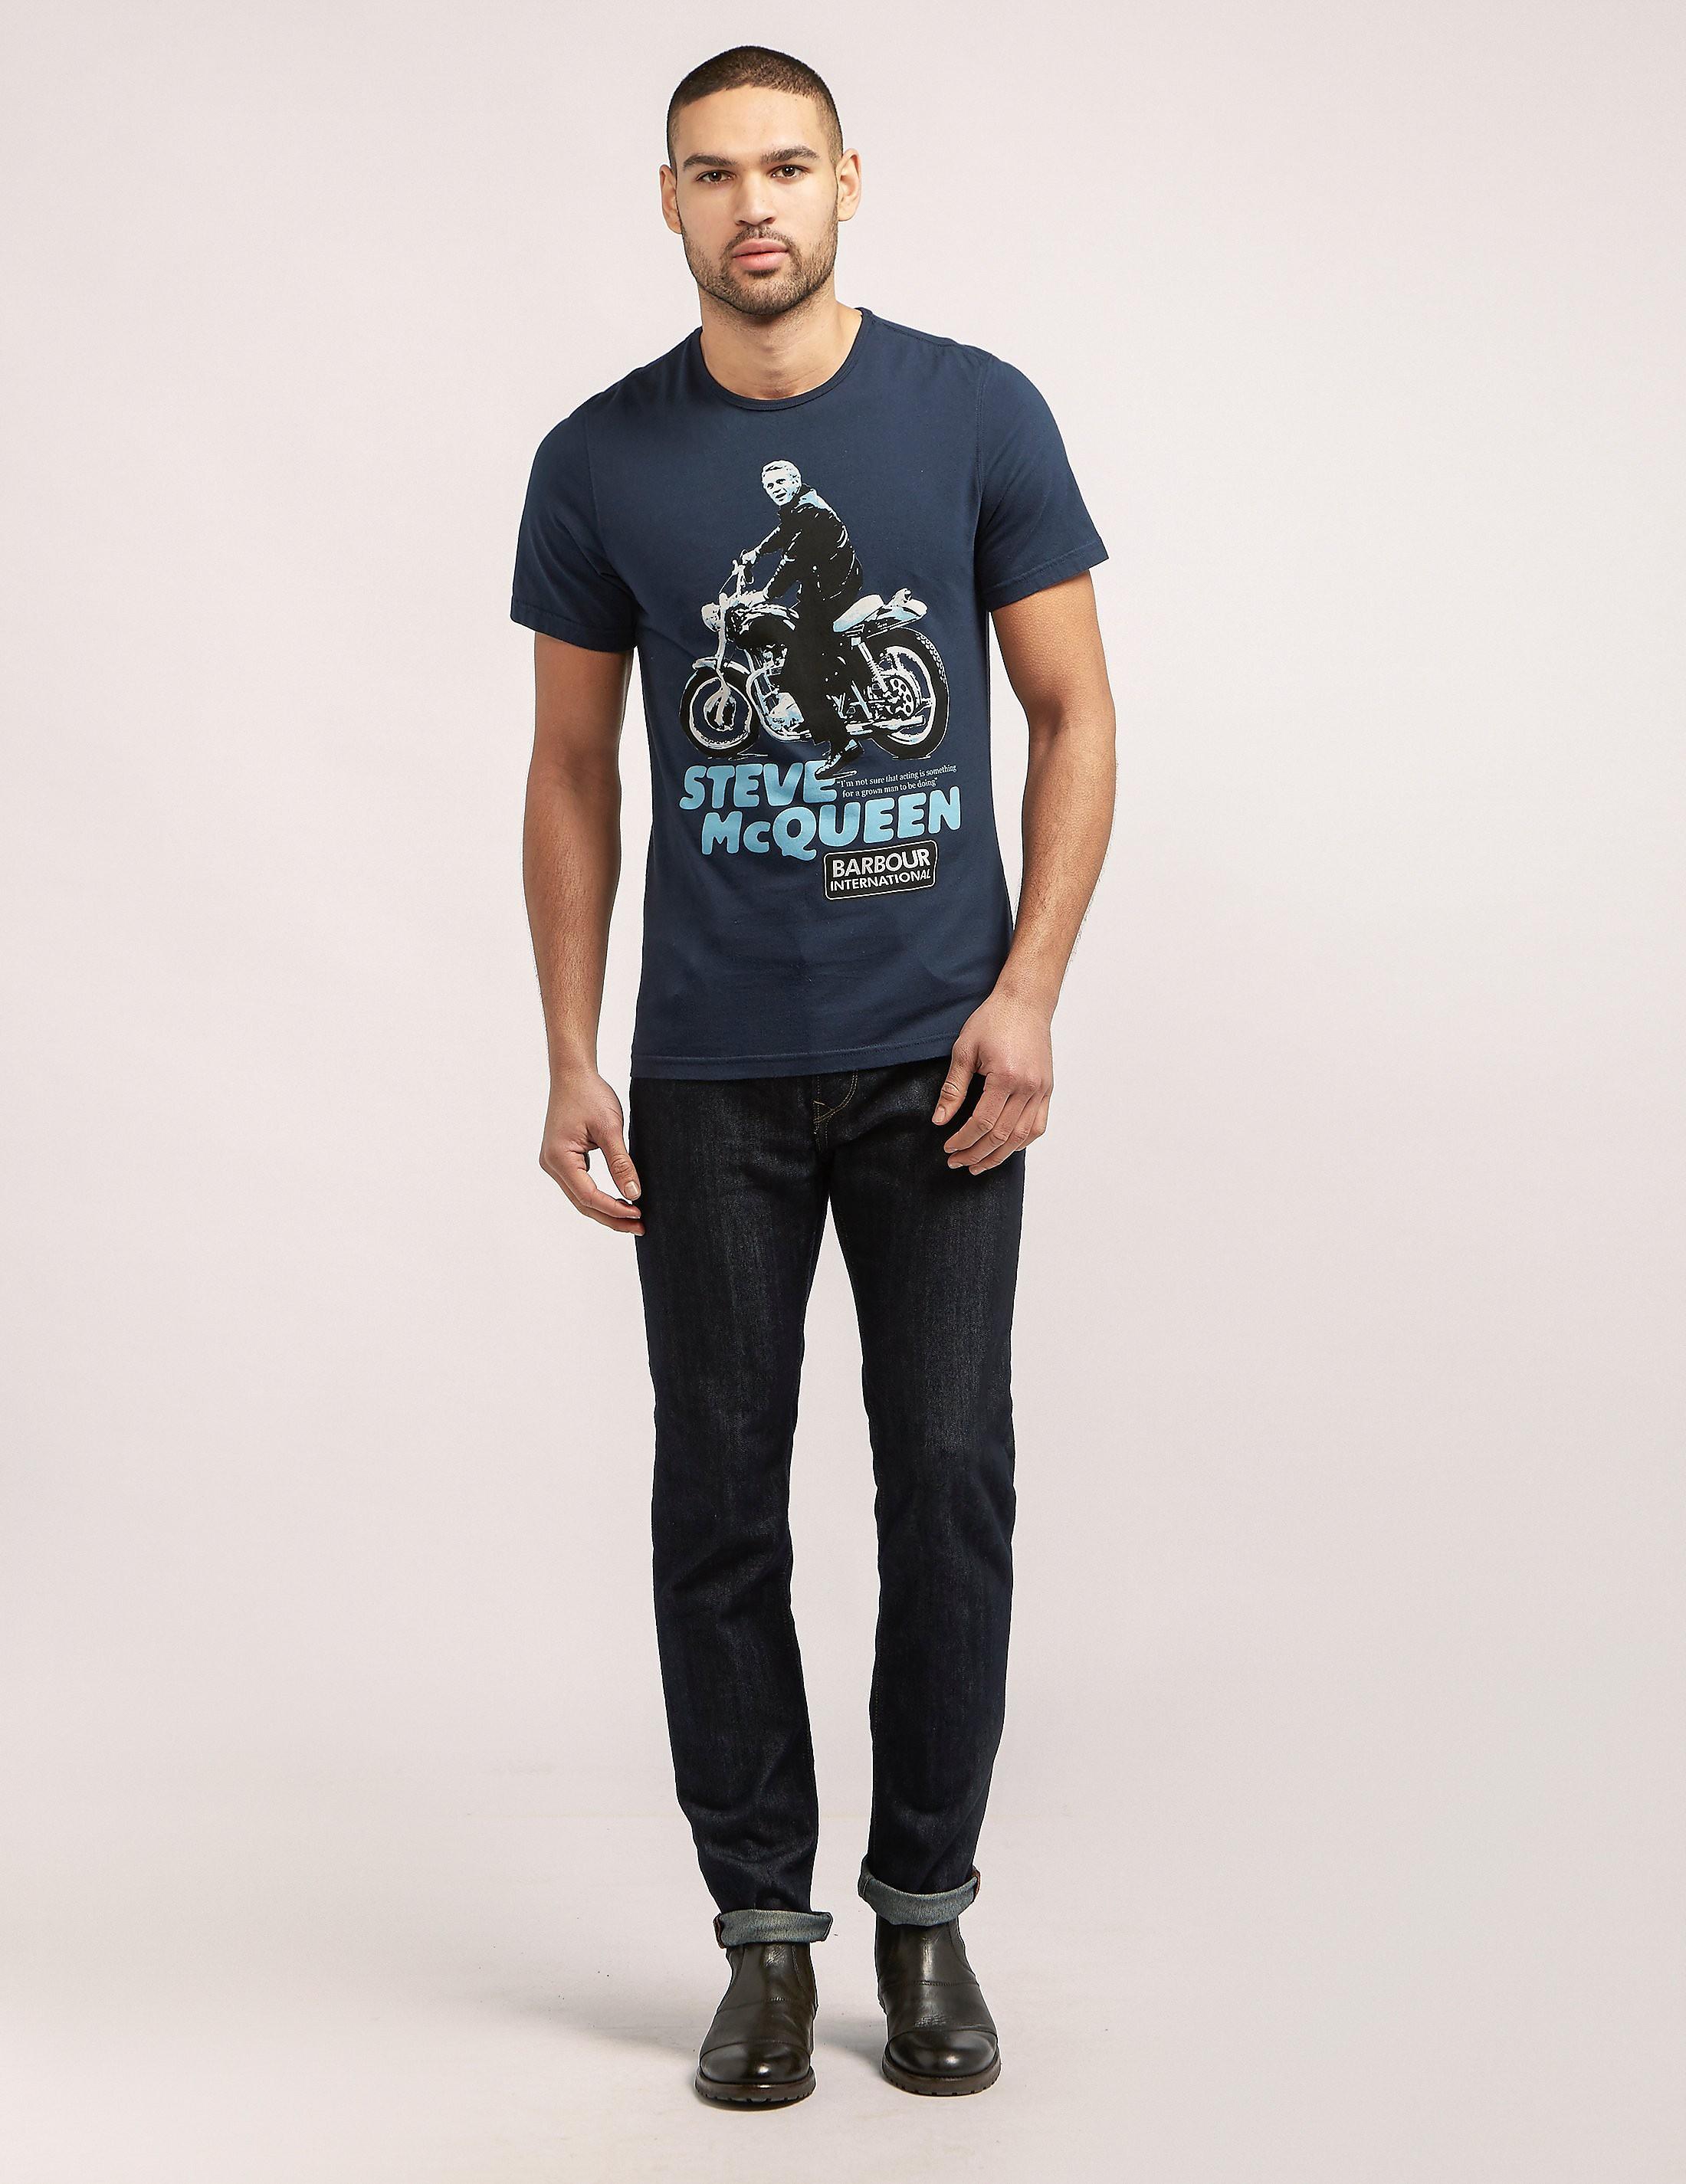 Barbour Steve McQueen Park Short Sleeve T-Shirt